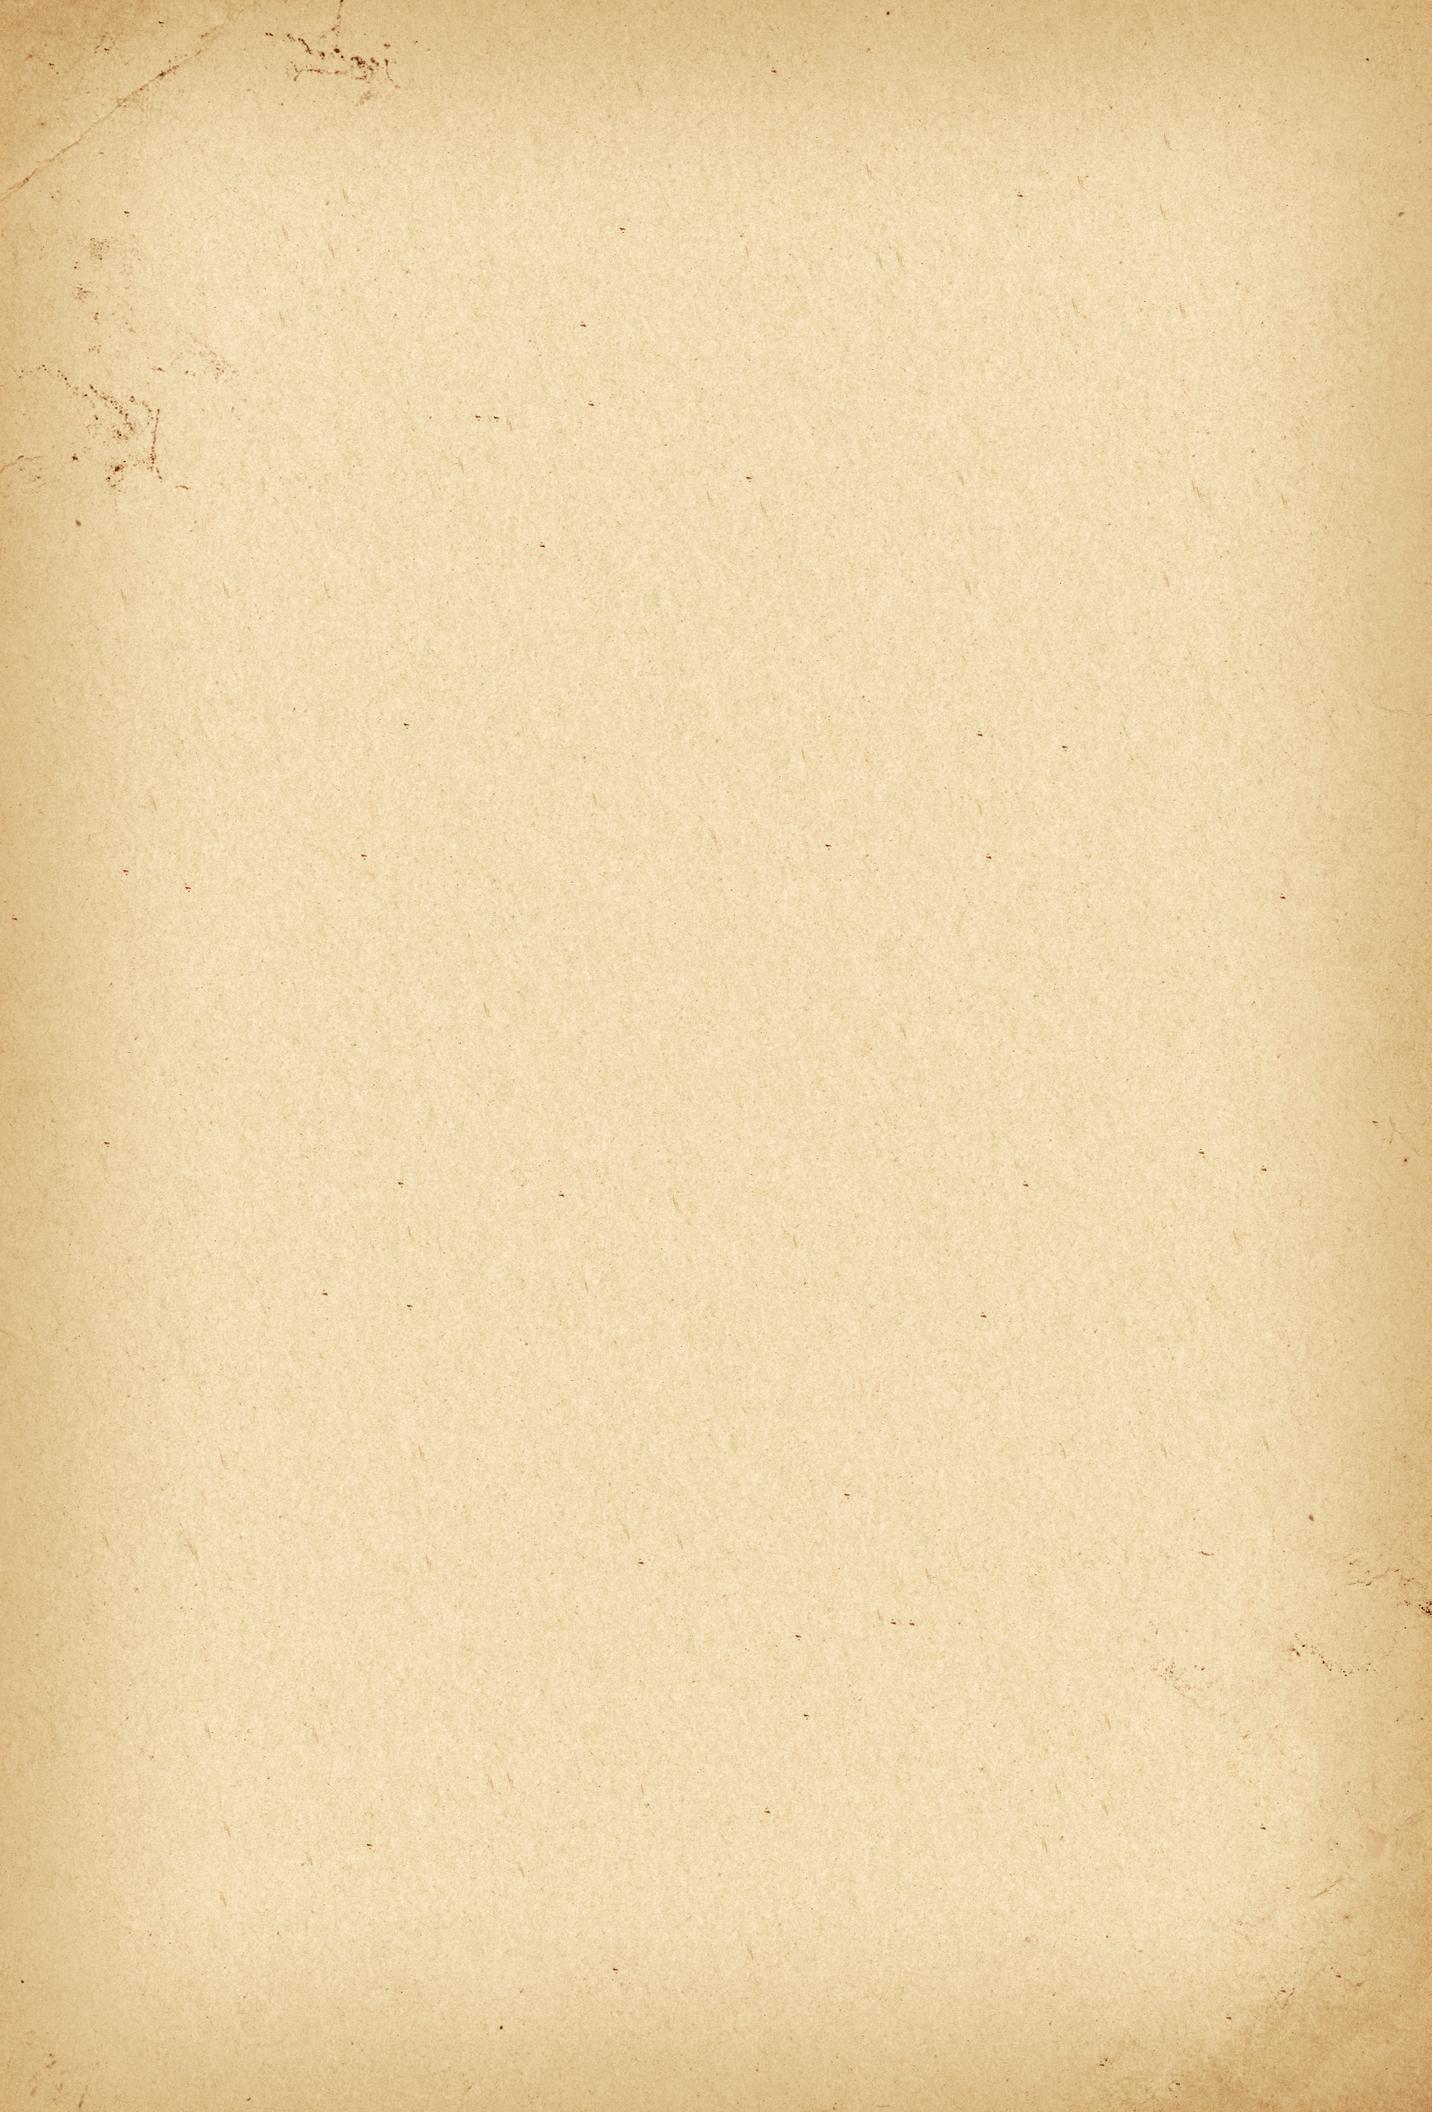 Brown Paper Sheet transparent PNG.